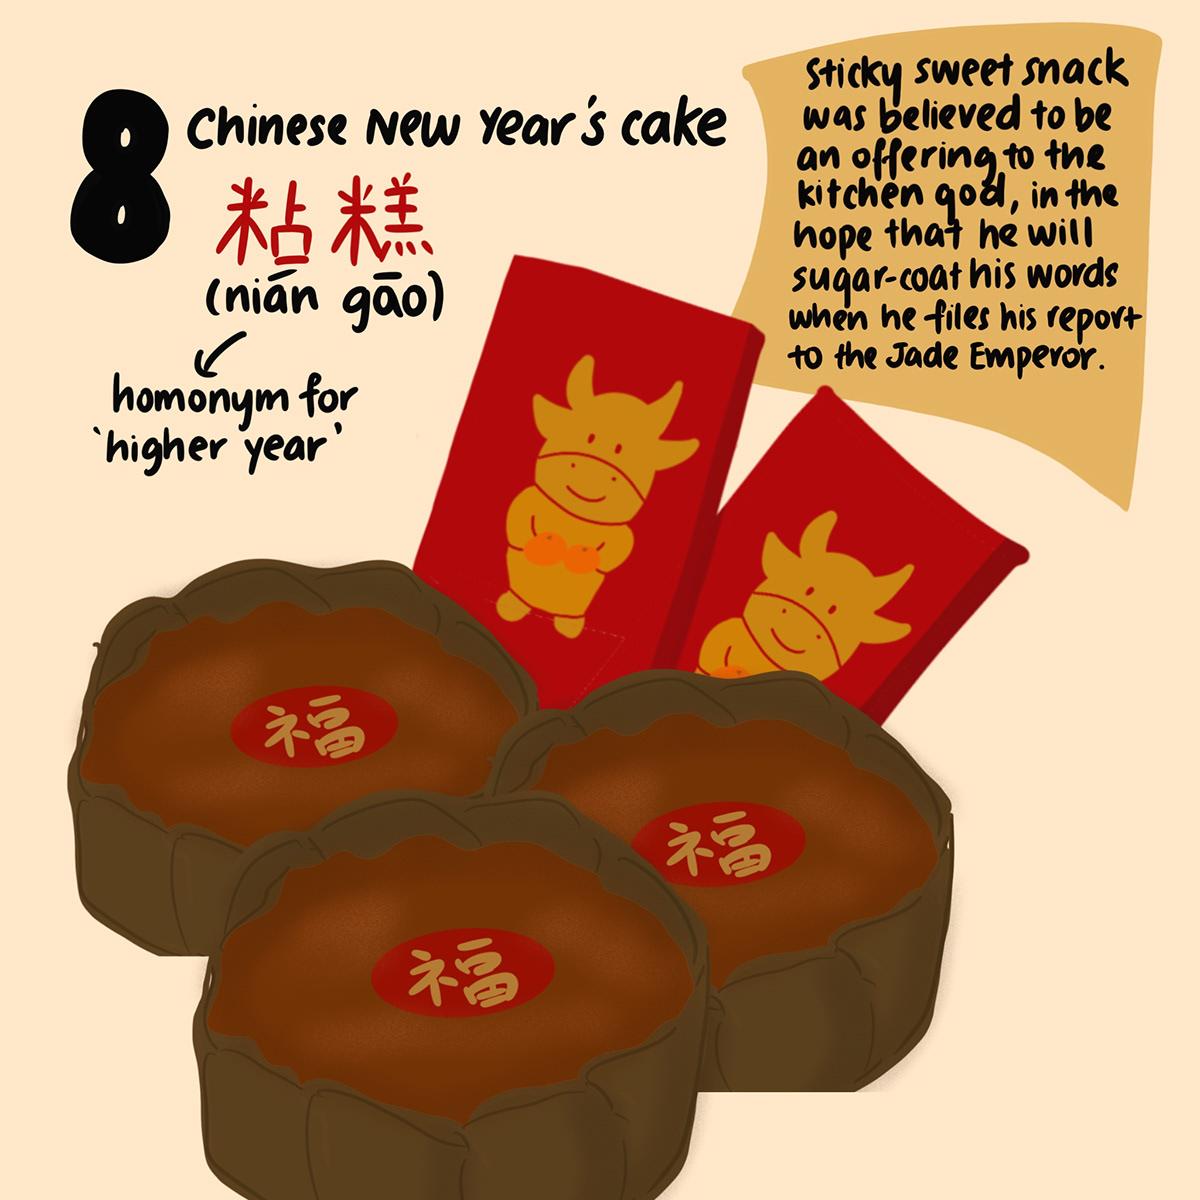 chinese new year cny customs digital illustration ILLUSTRATION  LNY Lunar New Year traditions